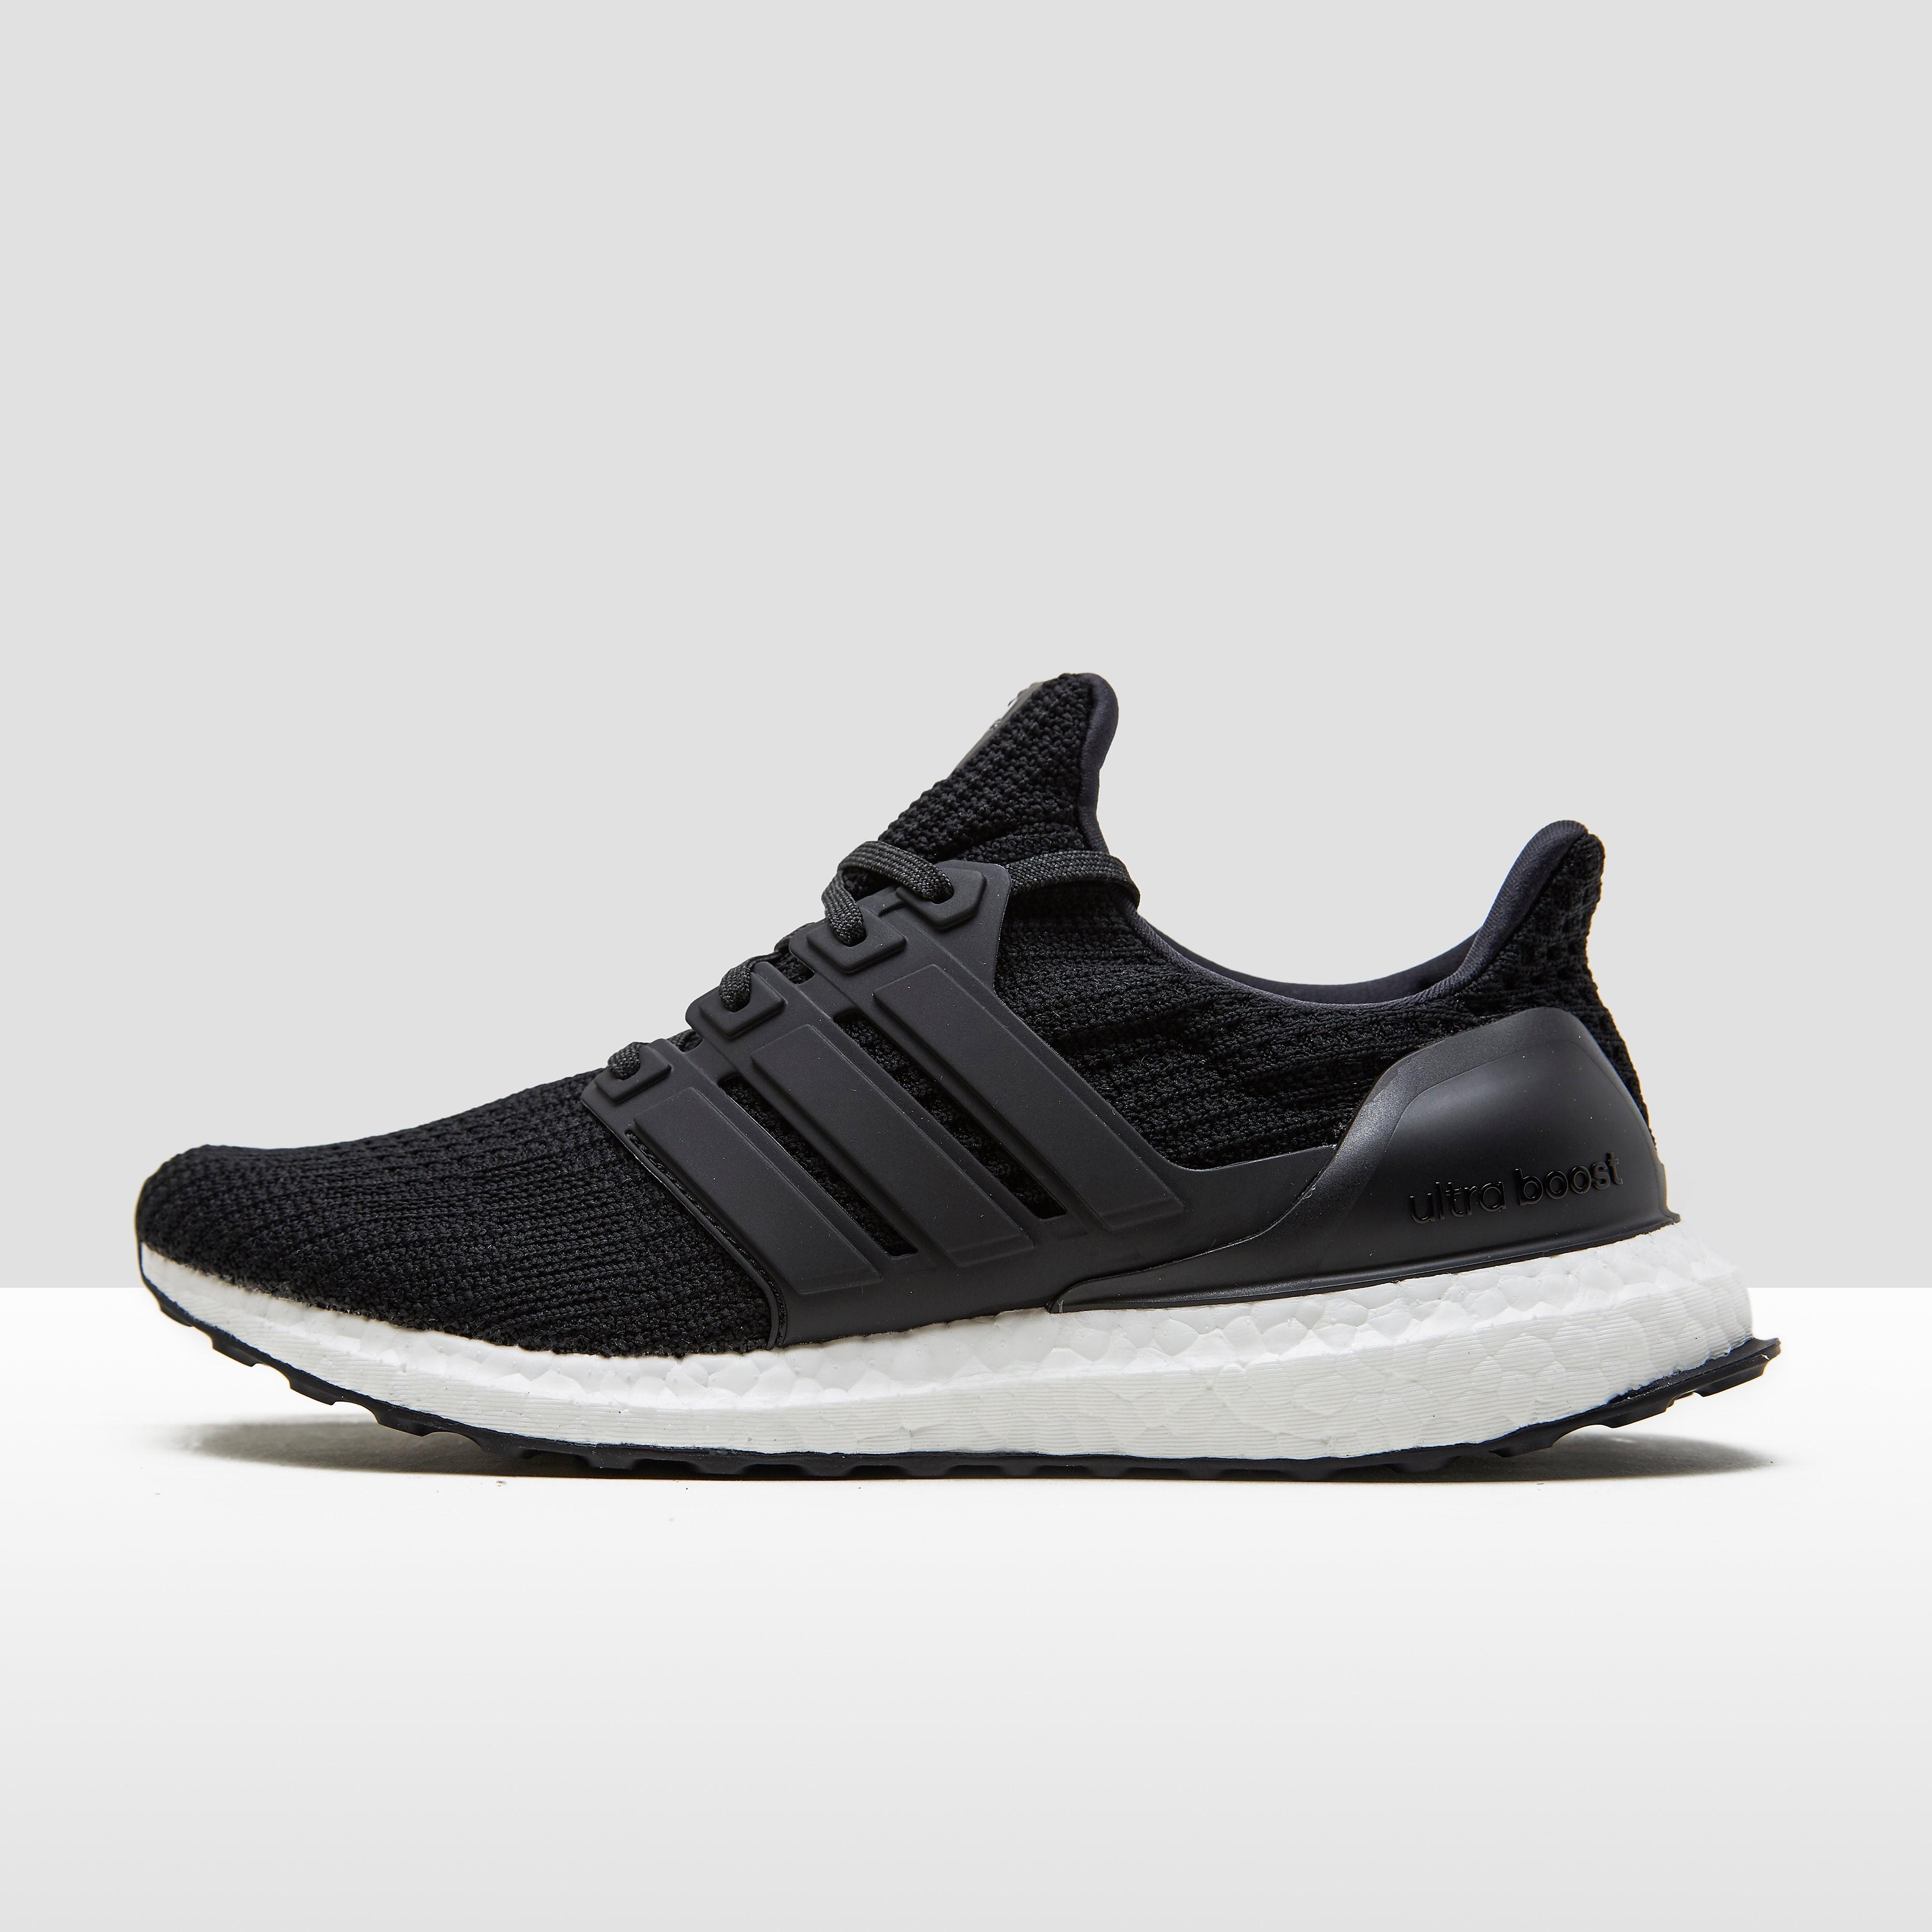 adidas Women's Ultra Boost 4.0 Running Shoes Black US 8.5-UK 7 Black